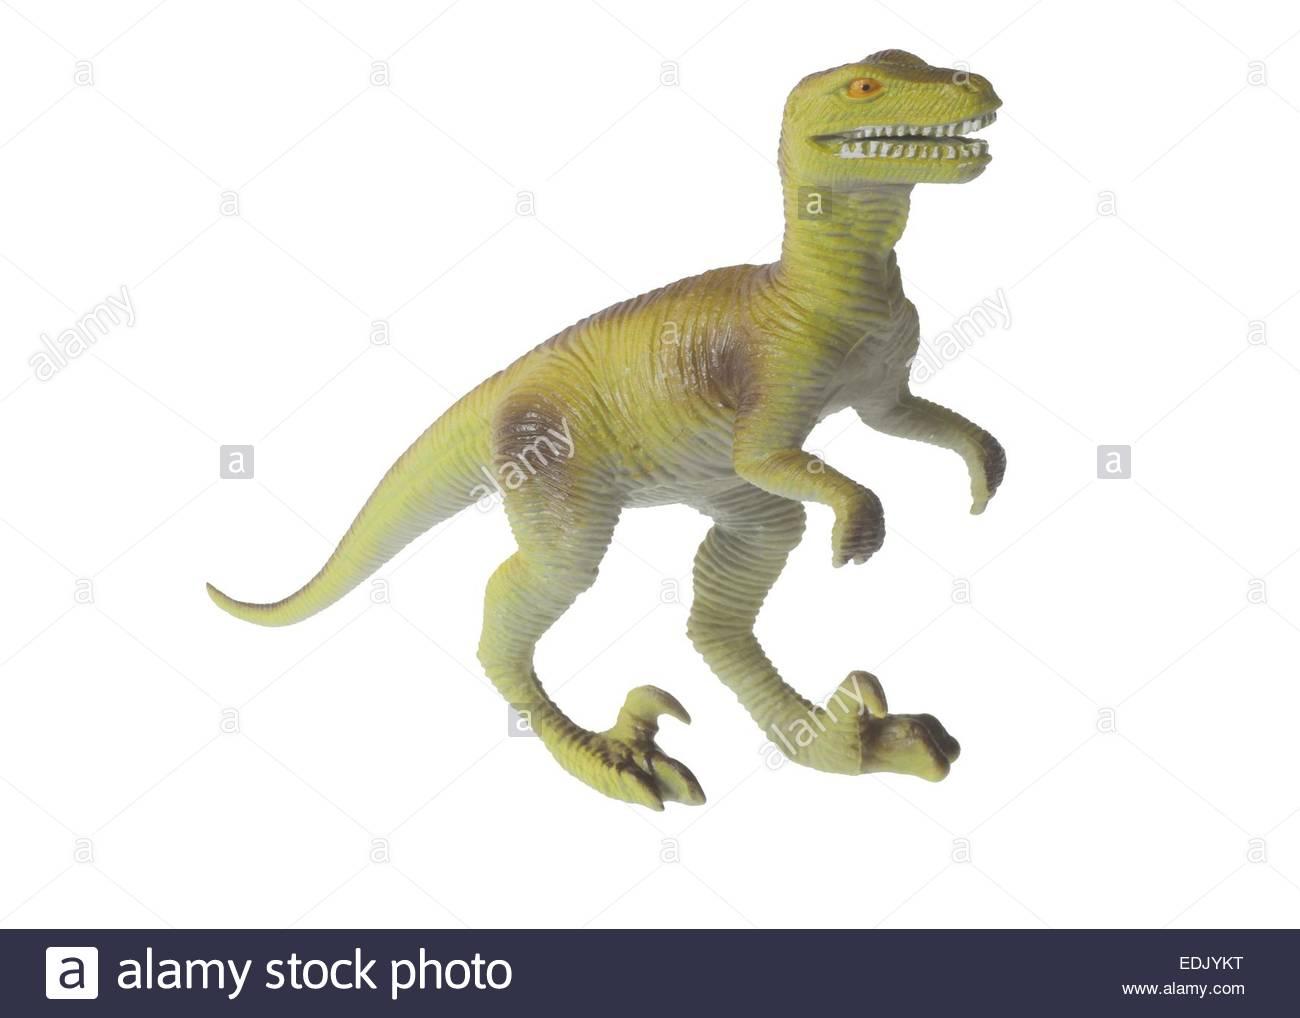 Jouet dinosaure sur fond blanc Photo Stock